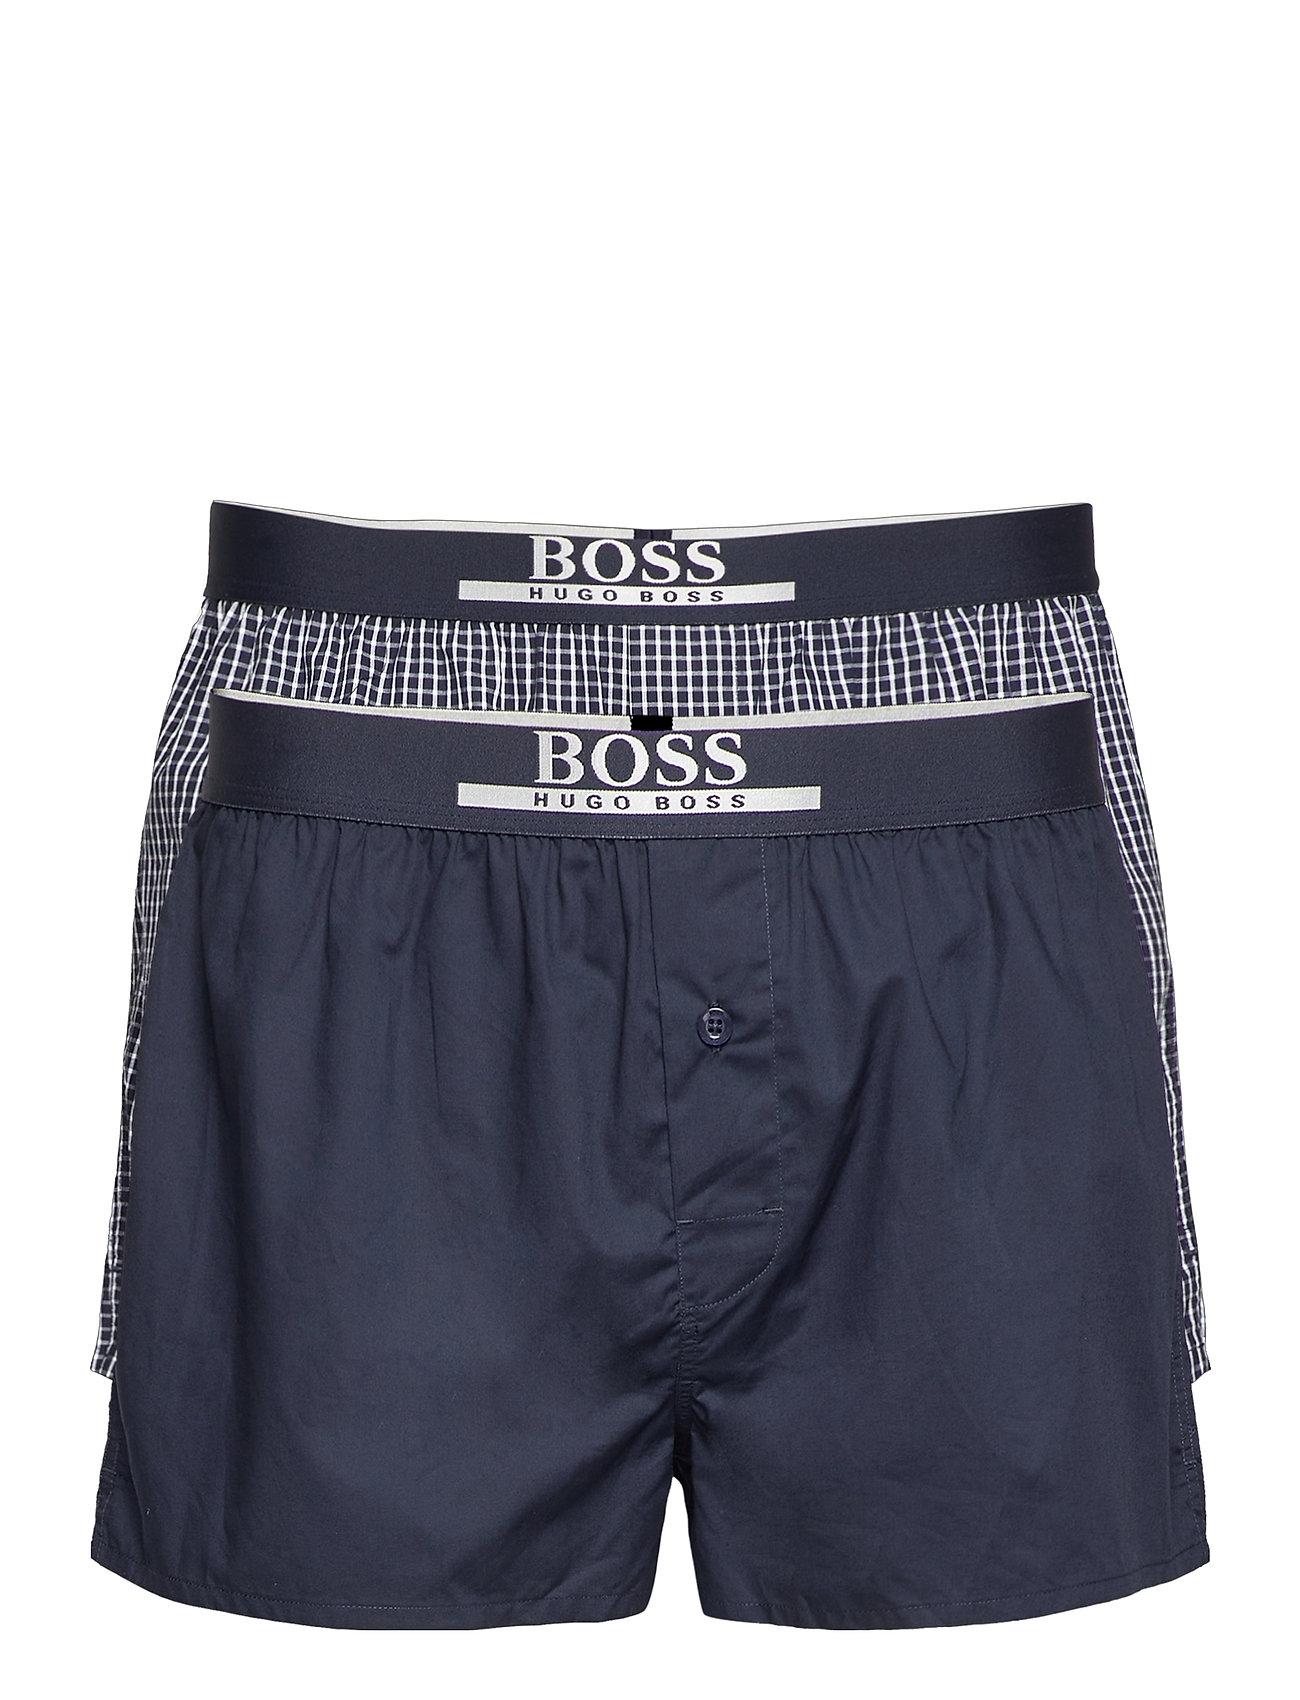 Image of 2p Boxer Shorts Ew Boxershorts Blå BOSS (3467806621)